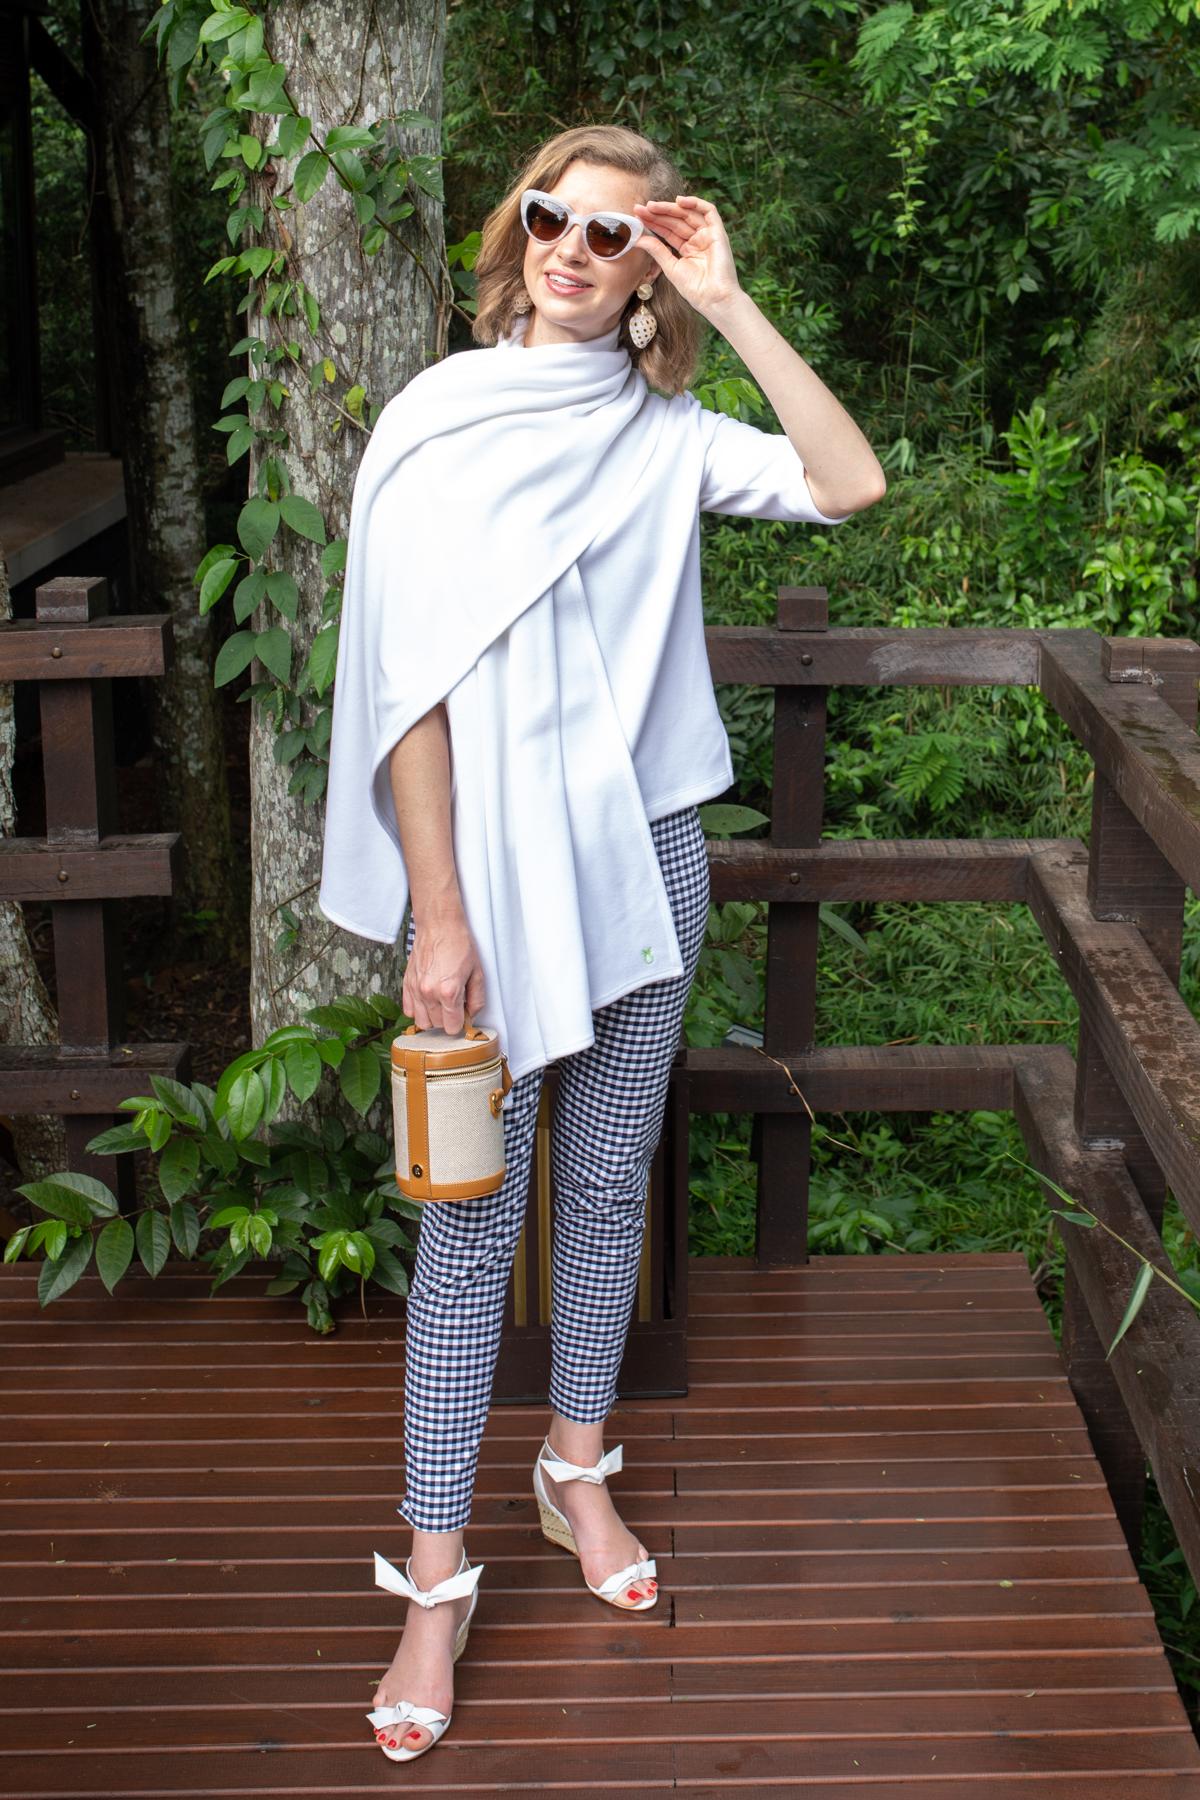 Stacie Flinner x Dudley Stephens Stylish Fleece-13.jpg